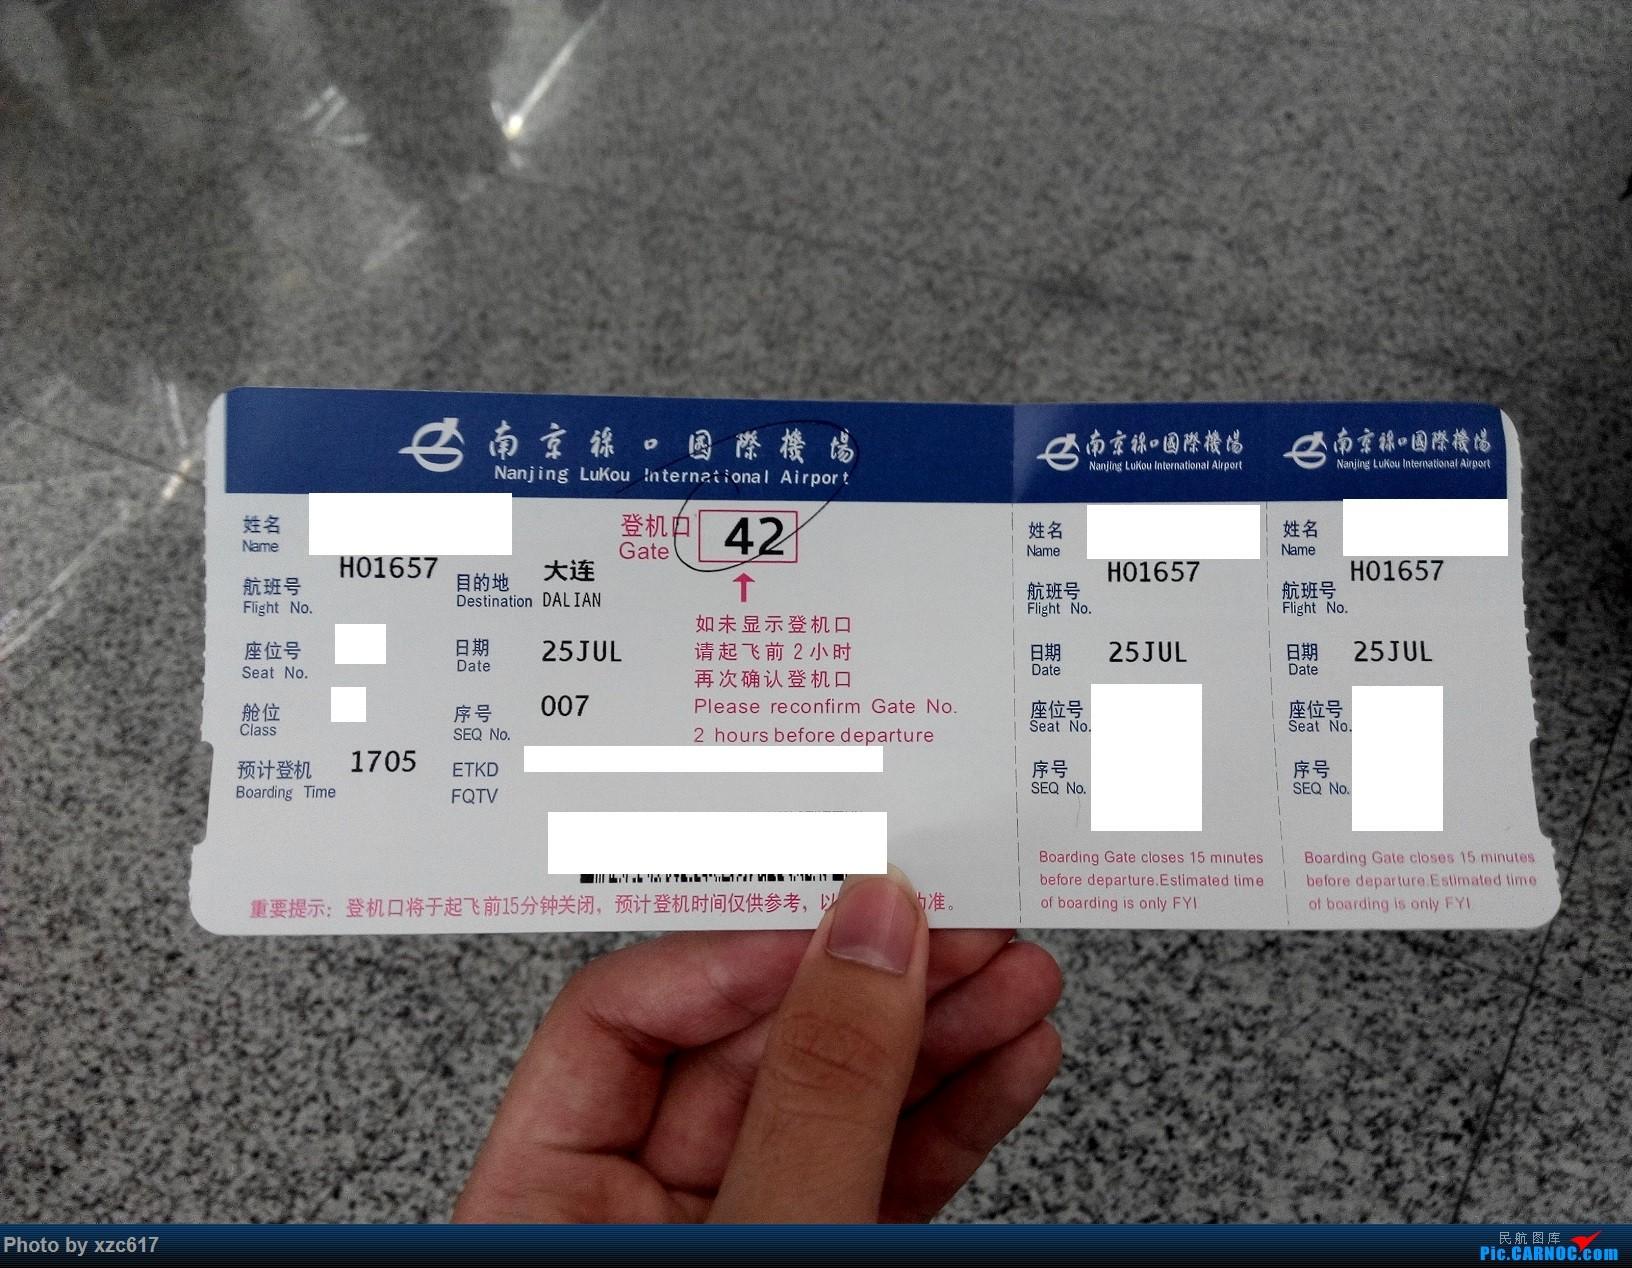 Re:[原创]xzc617的飞行游记 NO.1 由扬州到大连,平生第一次游海岛